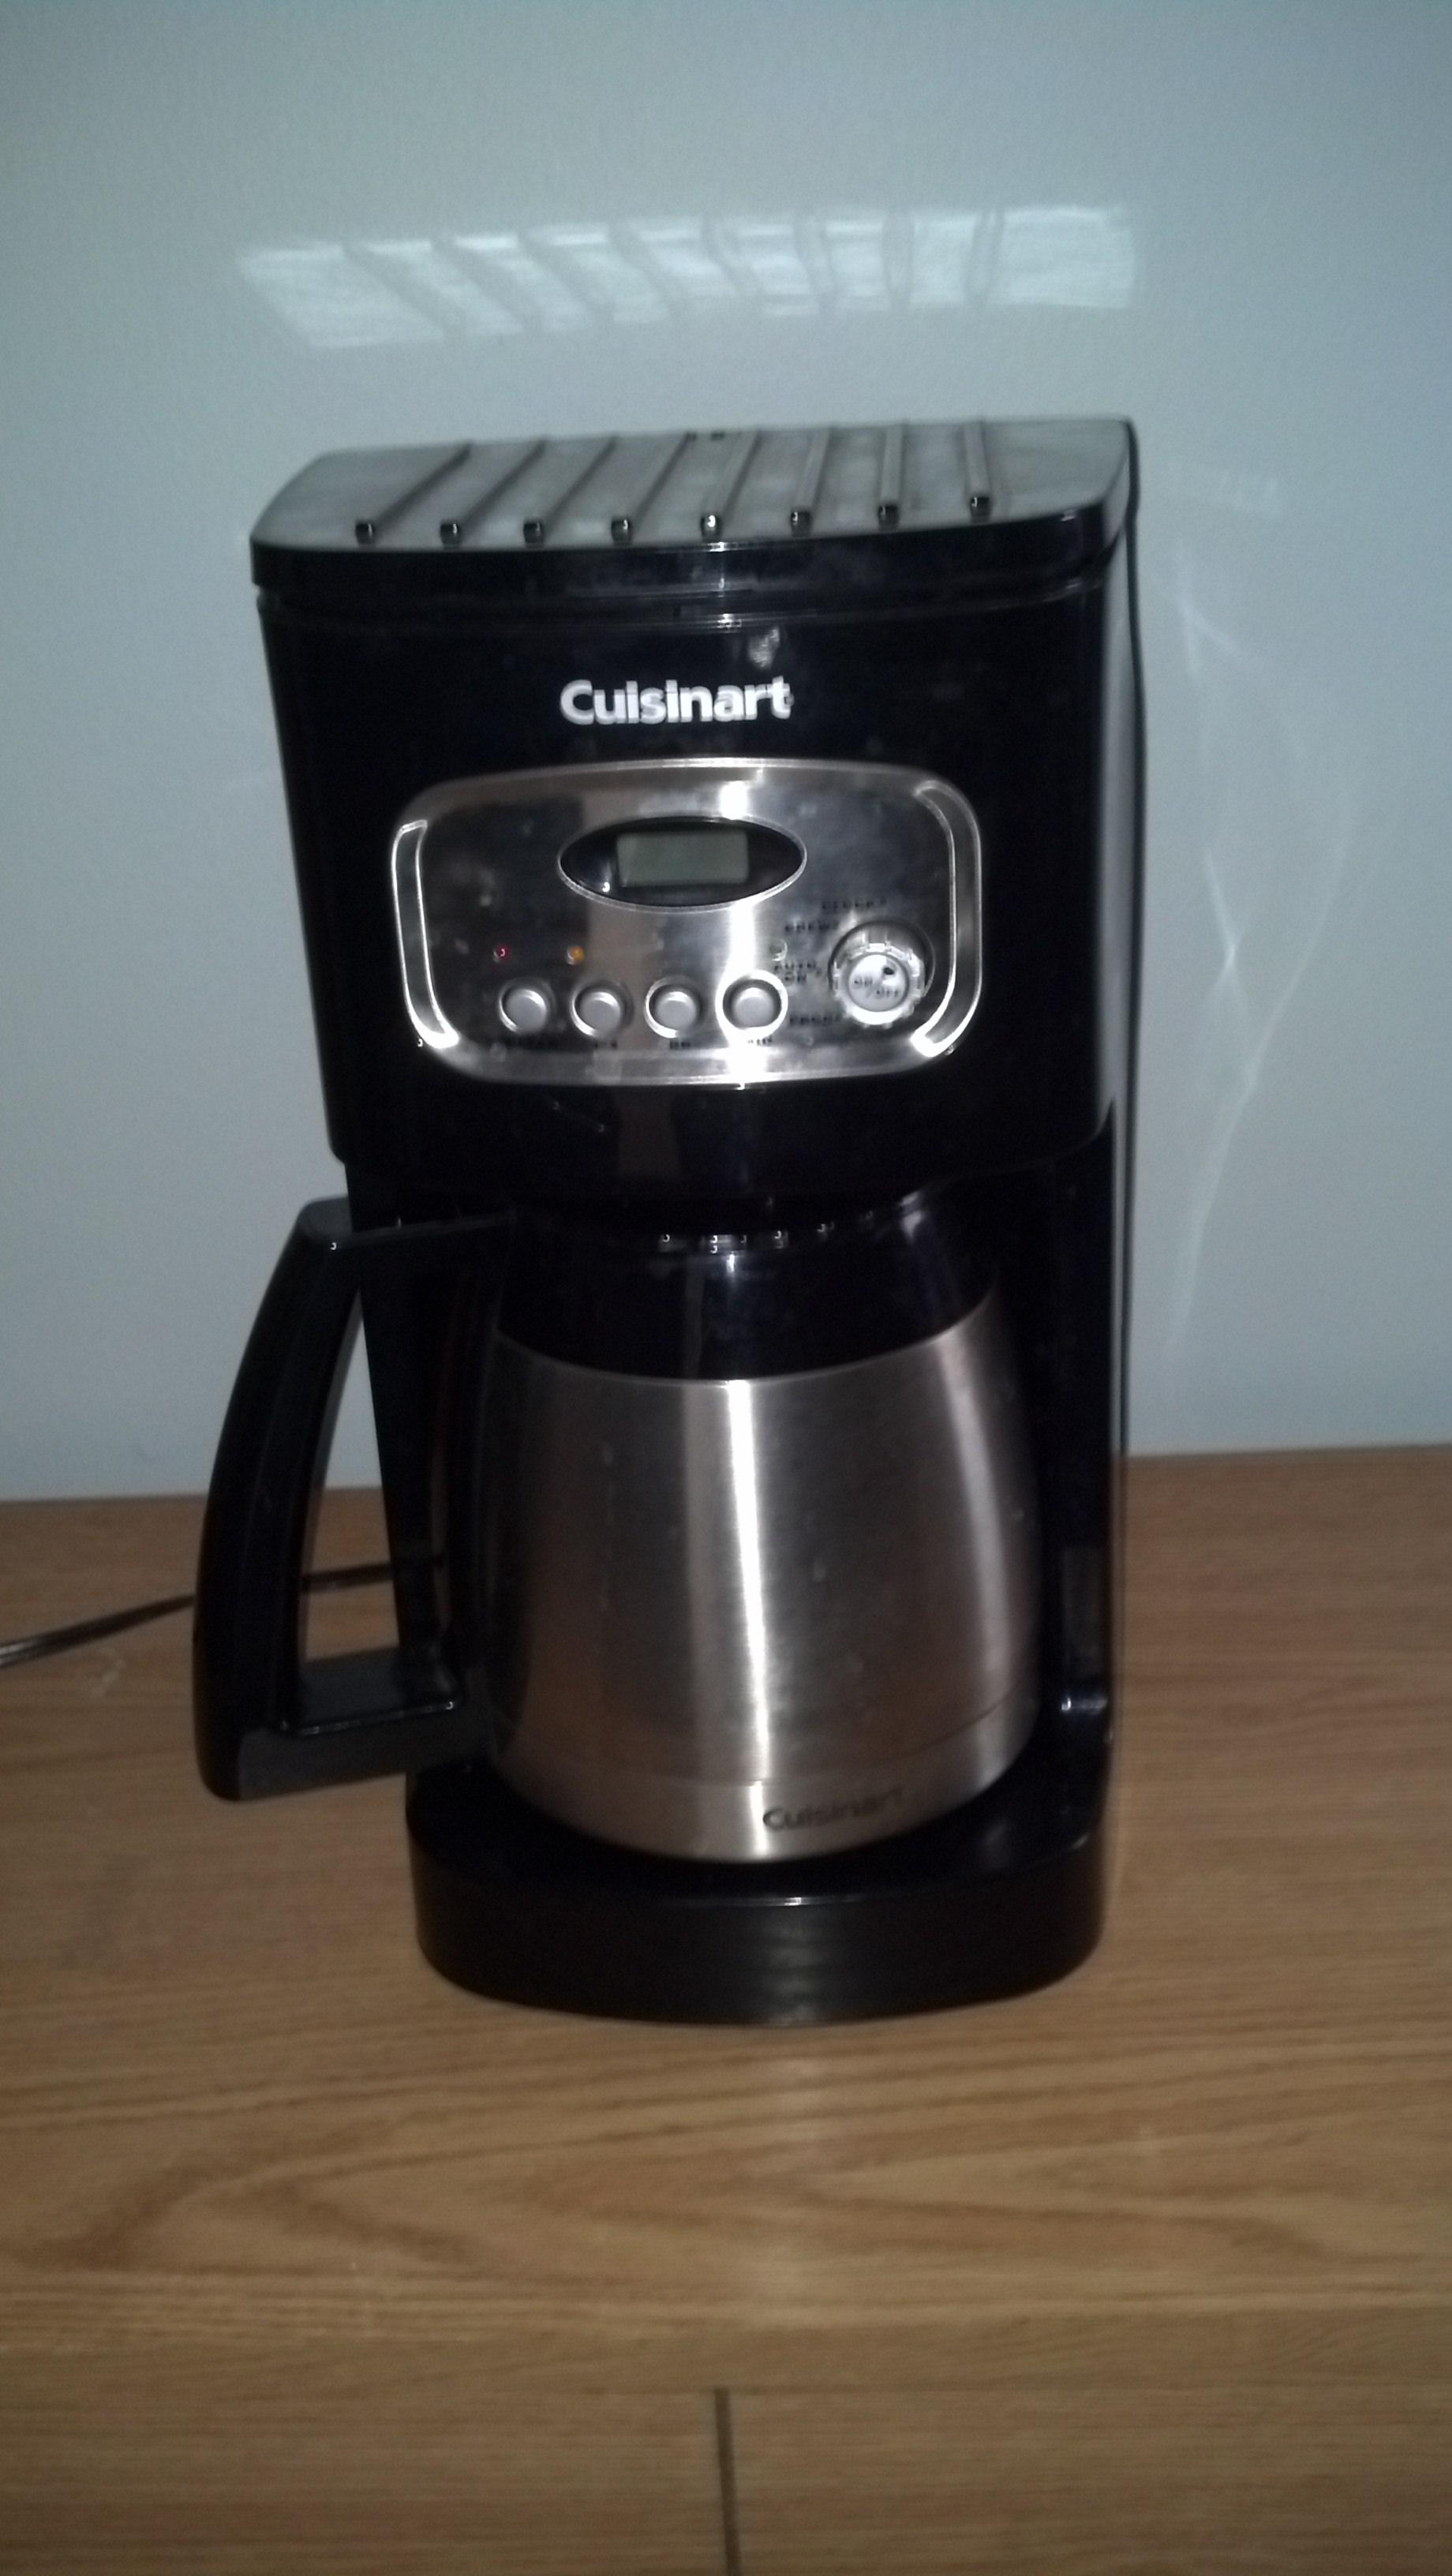 Cuisinart Electric Coffee Maker